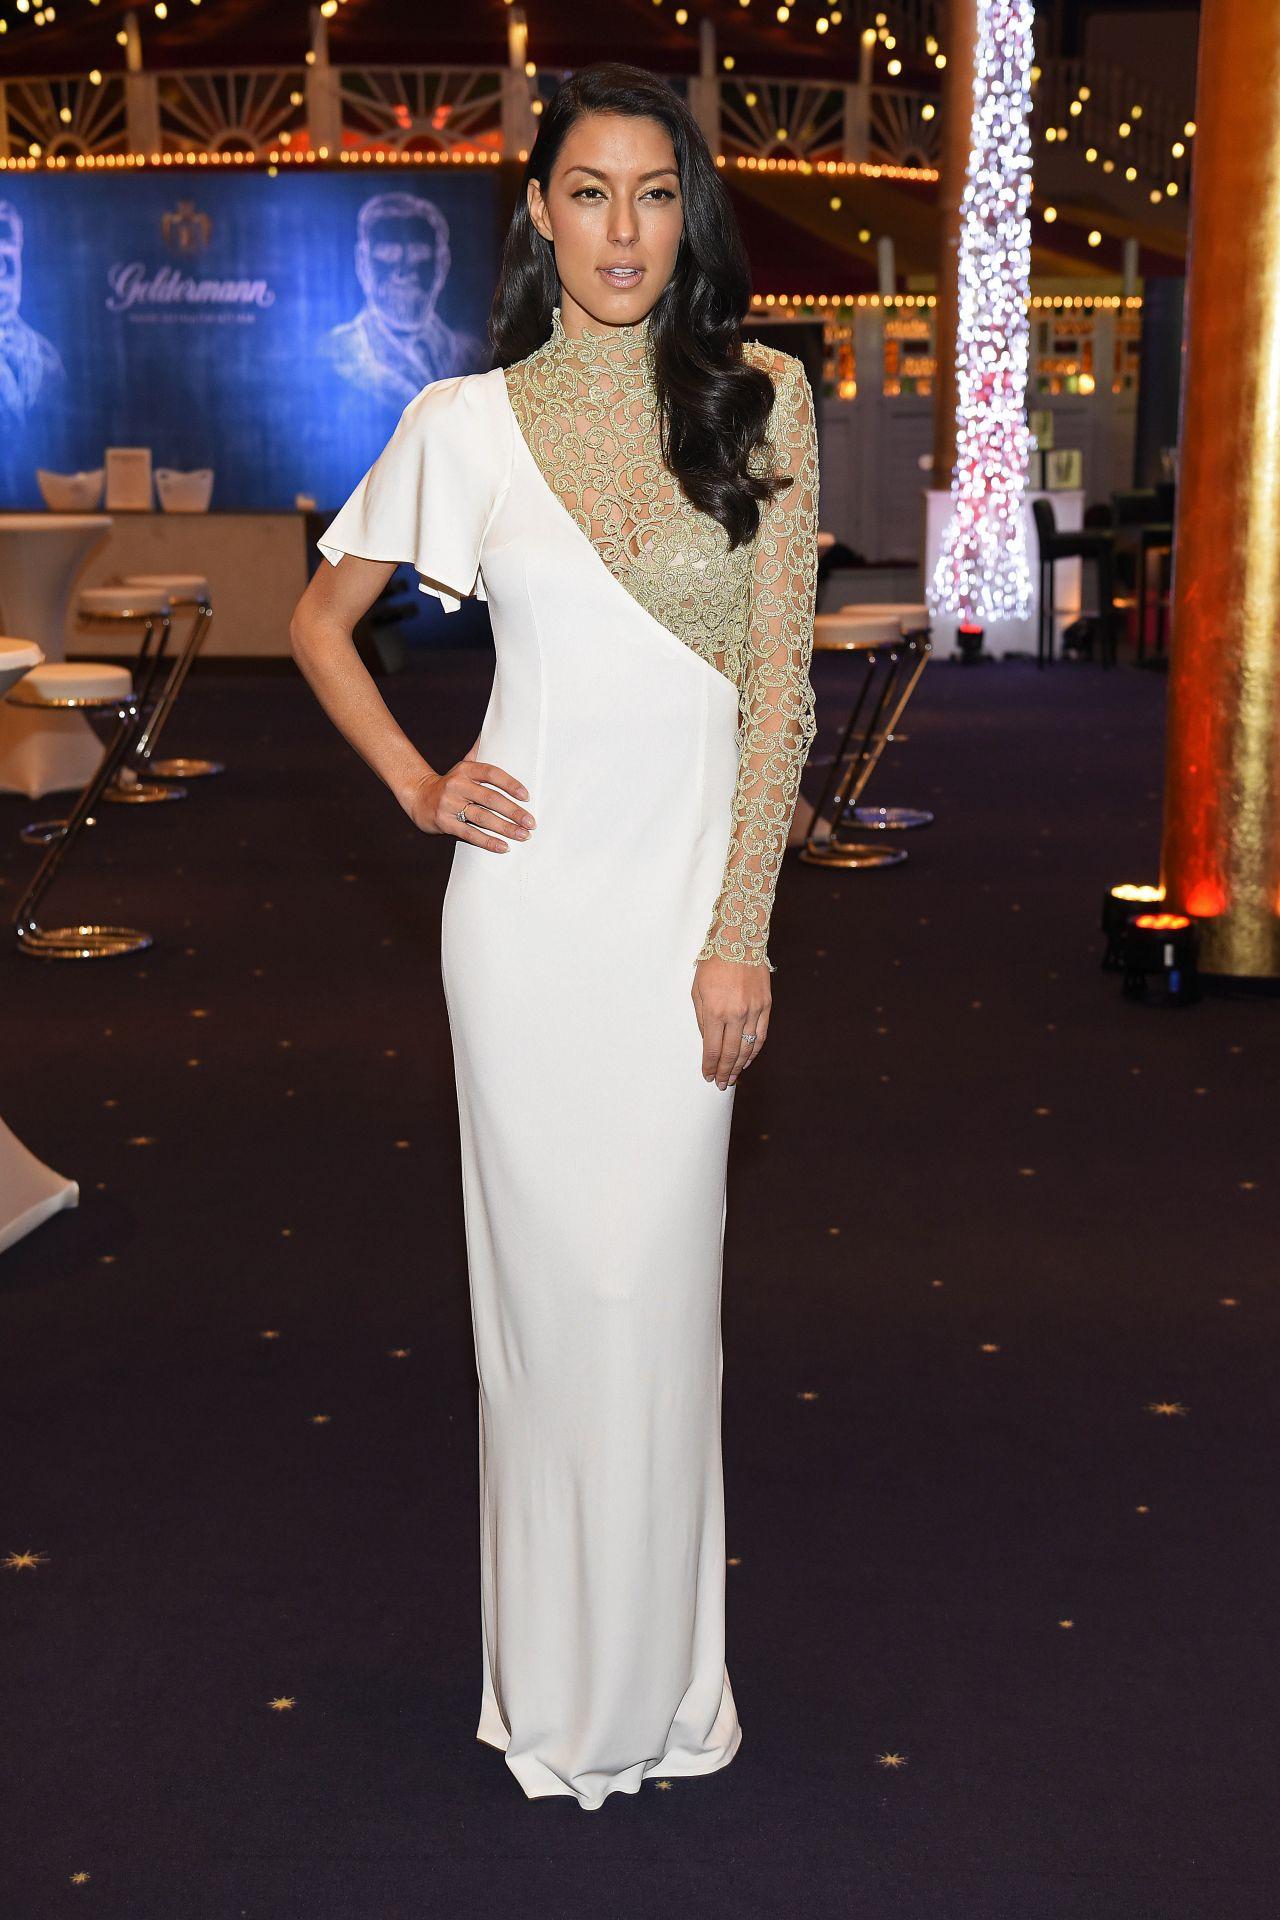 Rebecca Mir - Miss Germany 2018 • CelebMafia